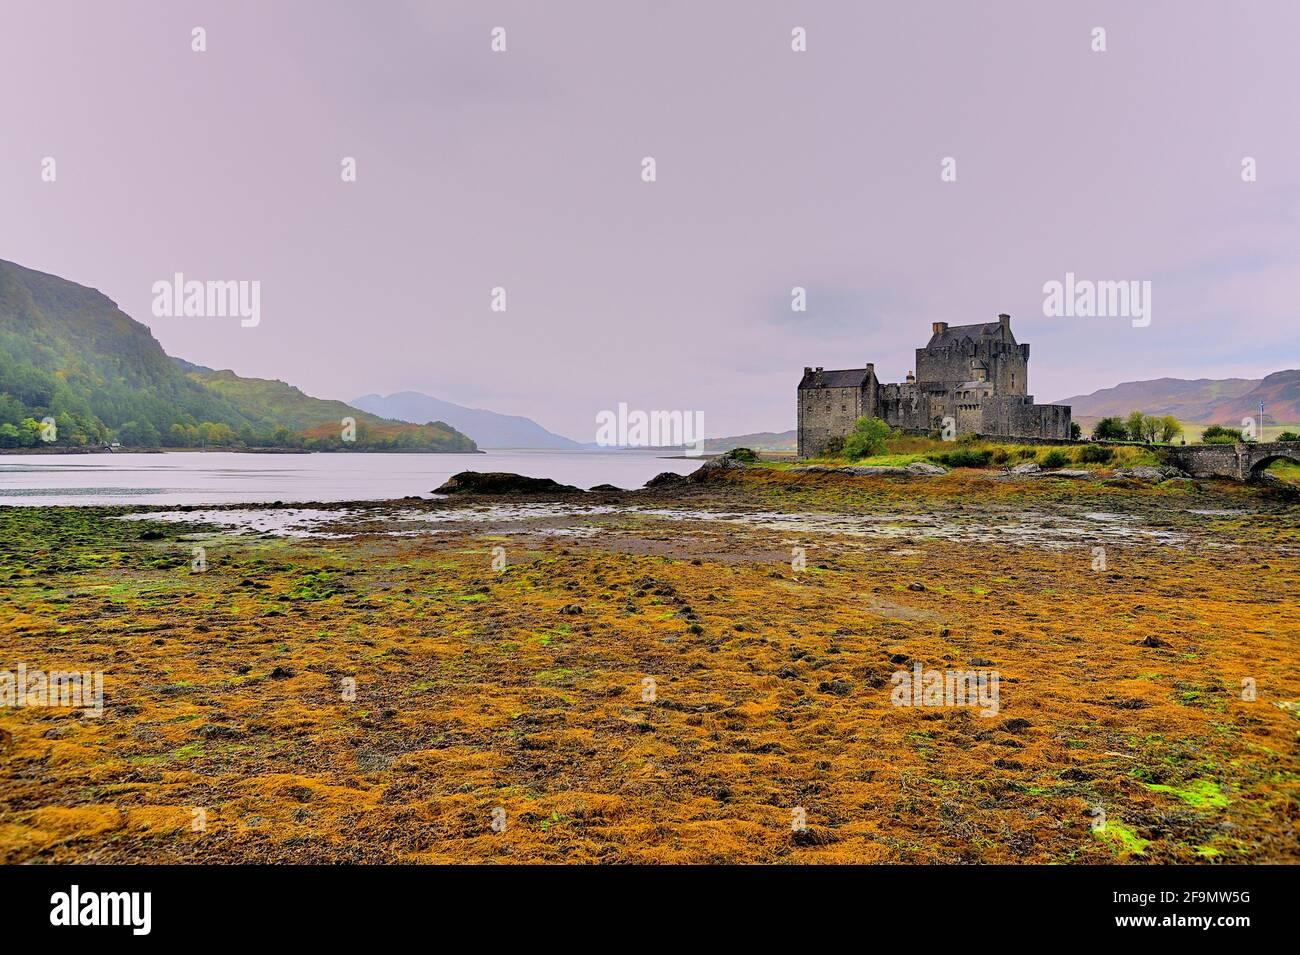 Dornie, near Kyle of Lochalsh, Northwest Highlands, Scotland, United Kingdom. Eilean Donan Castle, the most famous of all Highland castles. Stock Photo